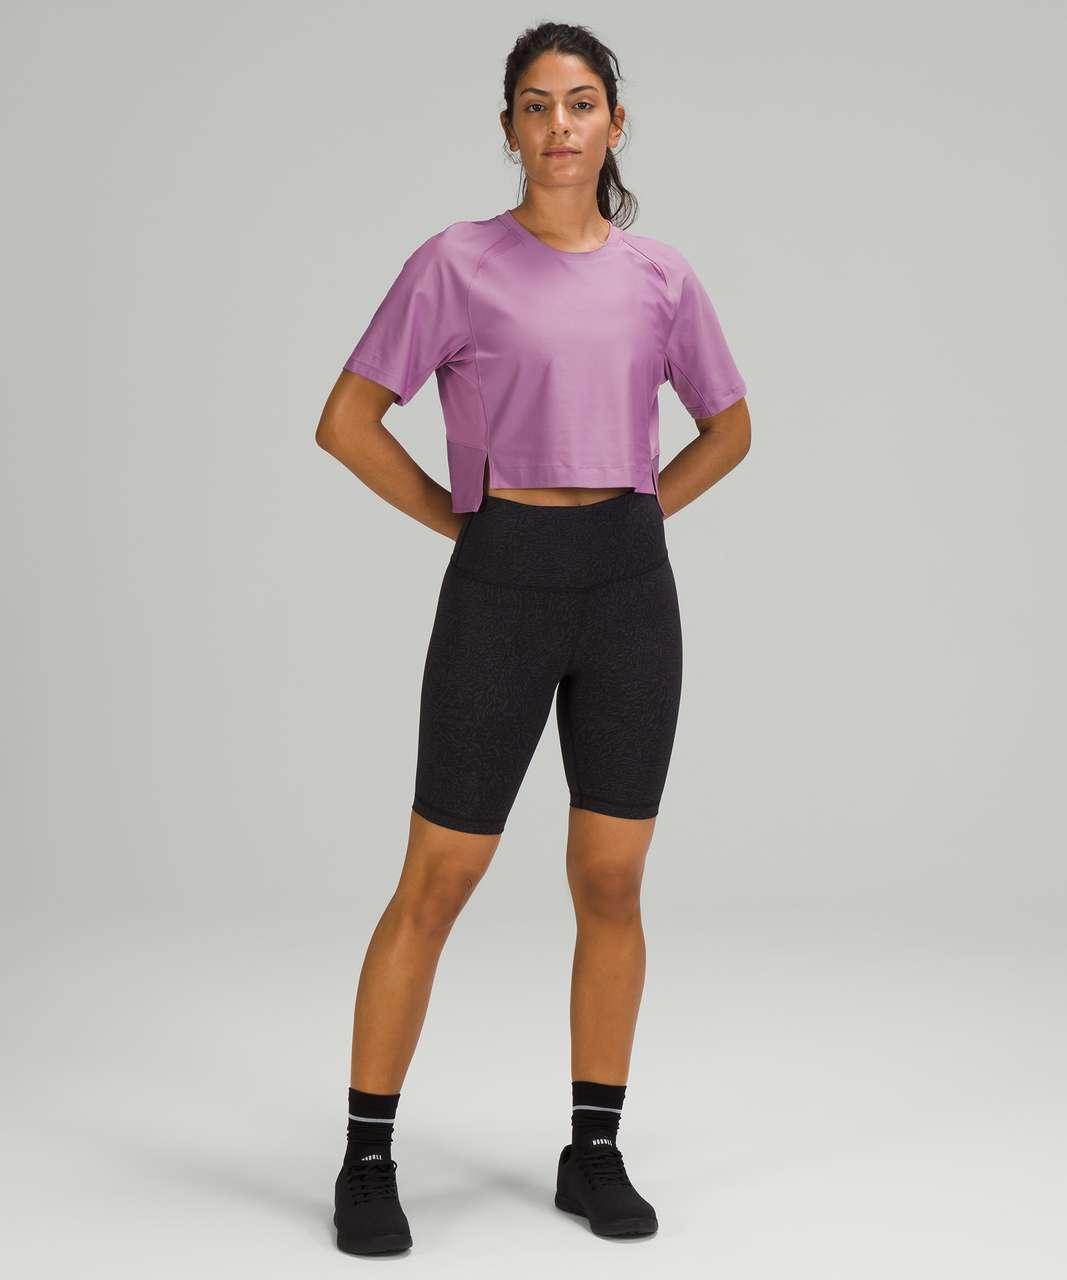 Lululemon Mesh Back Cropped Train T-Shirt - Wisteria Purple